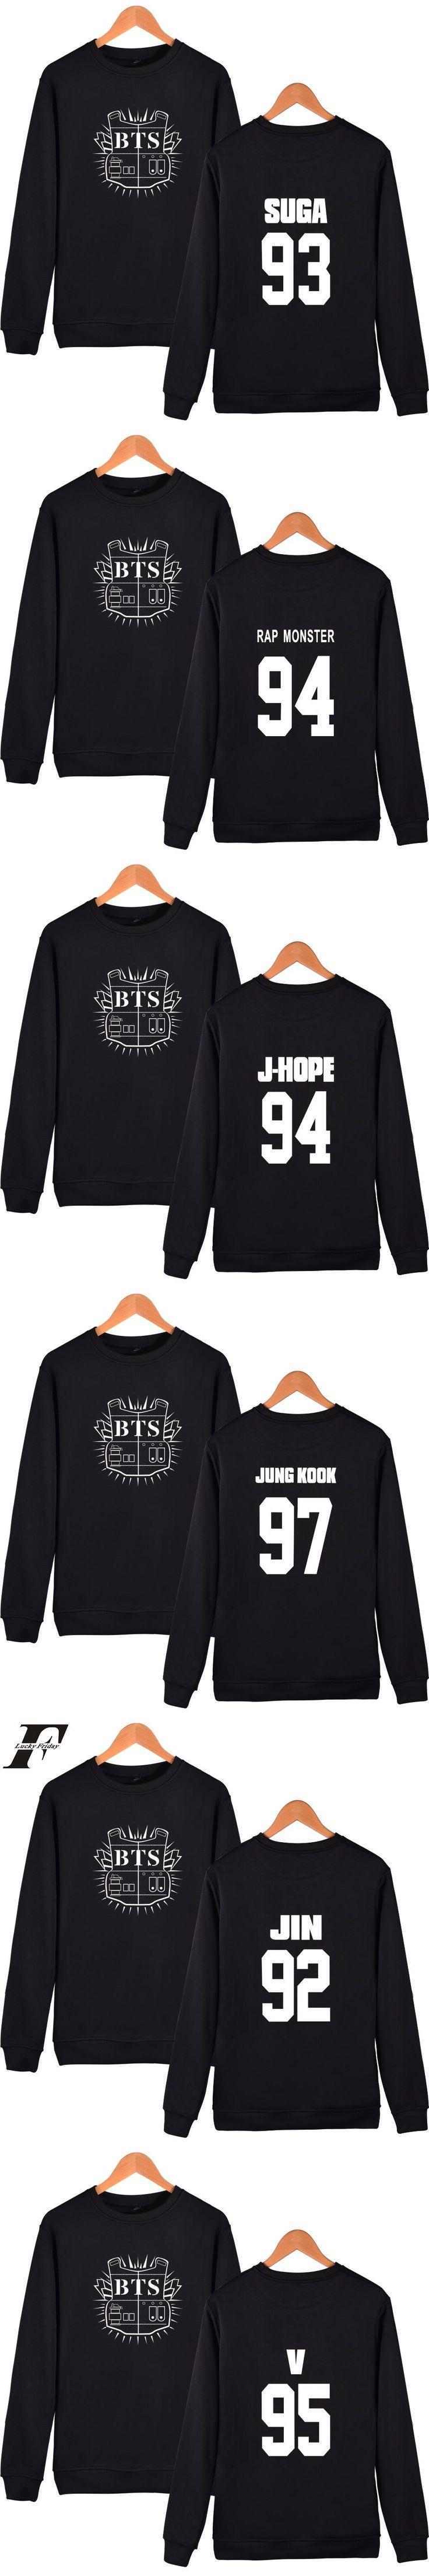 LUCKYFRIDAYF Kpop BTS Capless Sweatshirt men Korean Bangtan Boys Winter men Hoodies Sweatshirts Streetwear Hip Hop Clothes